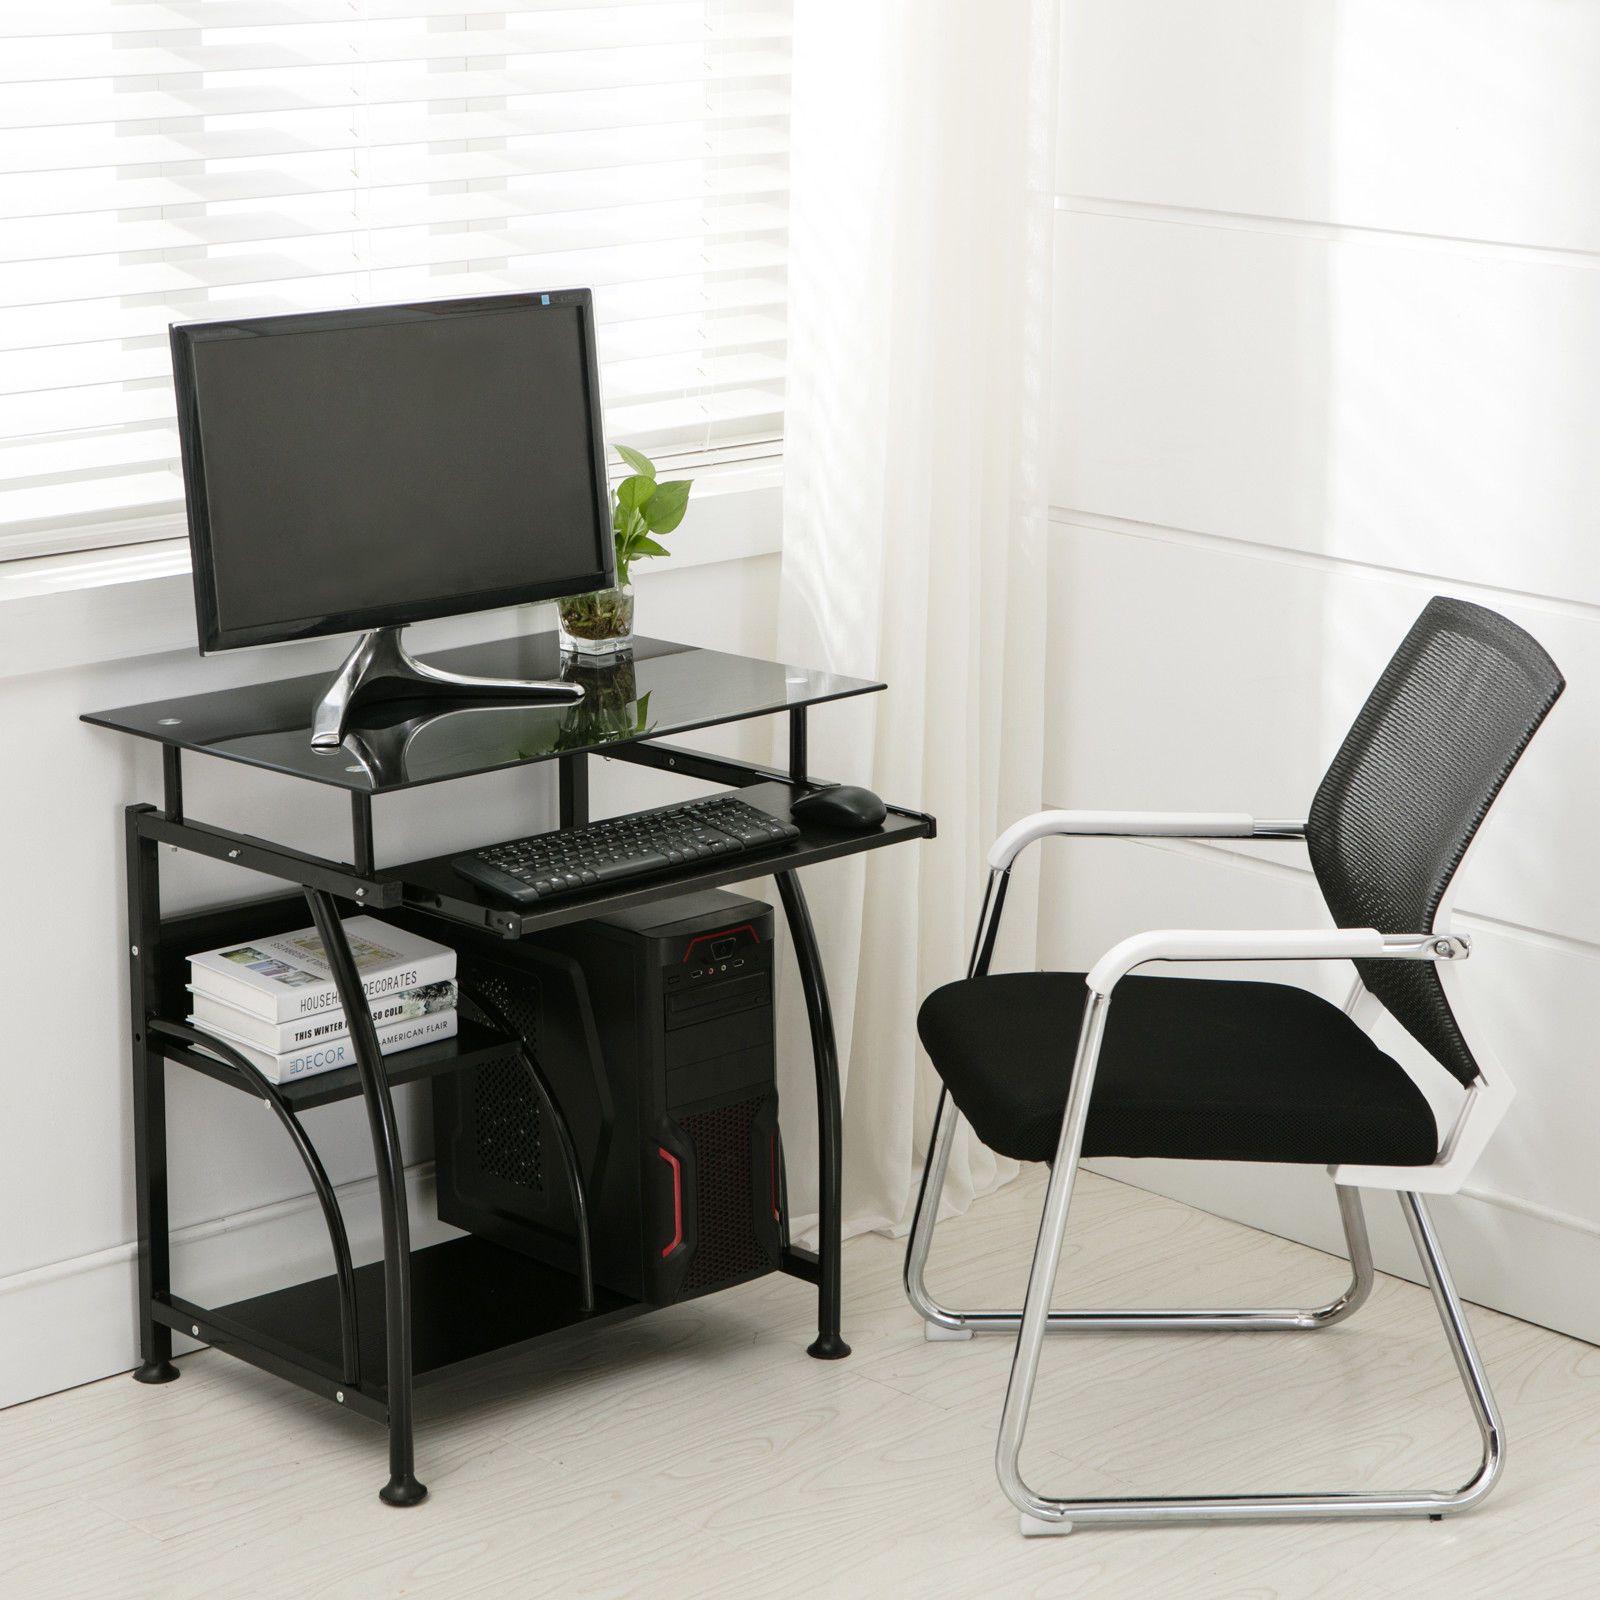 2019 Home Office PC Corner Computer Desk Laptop Table